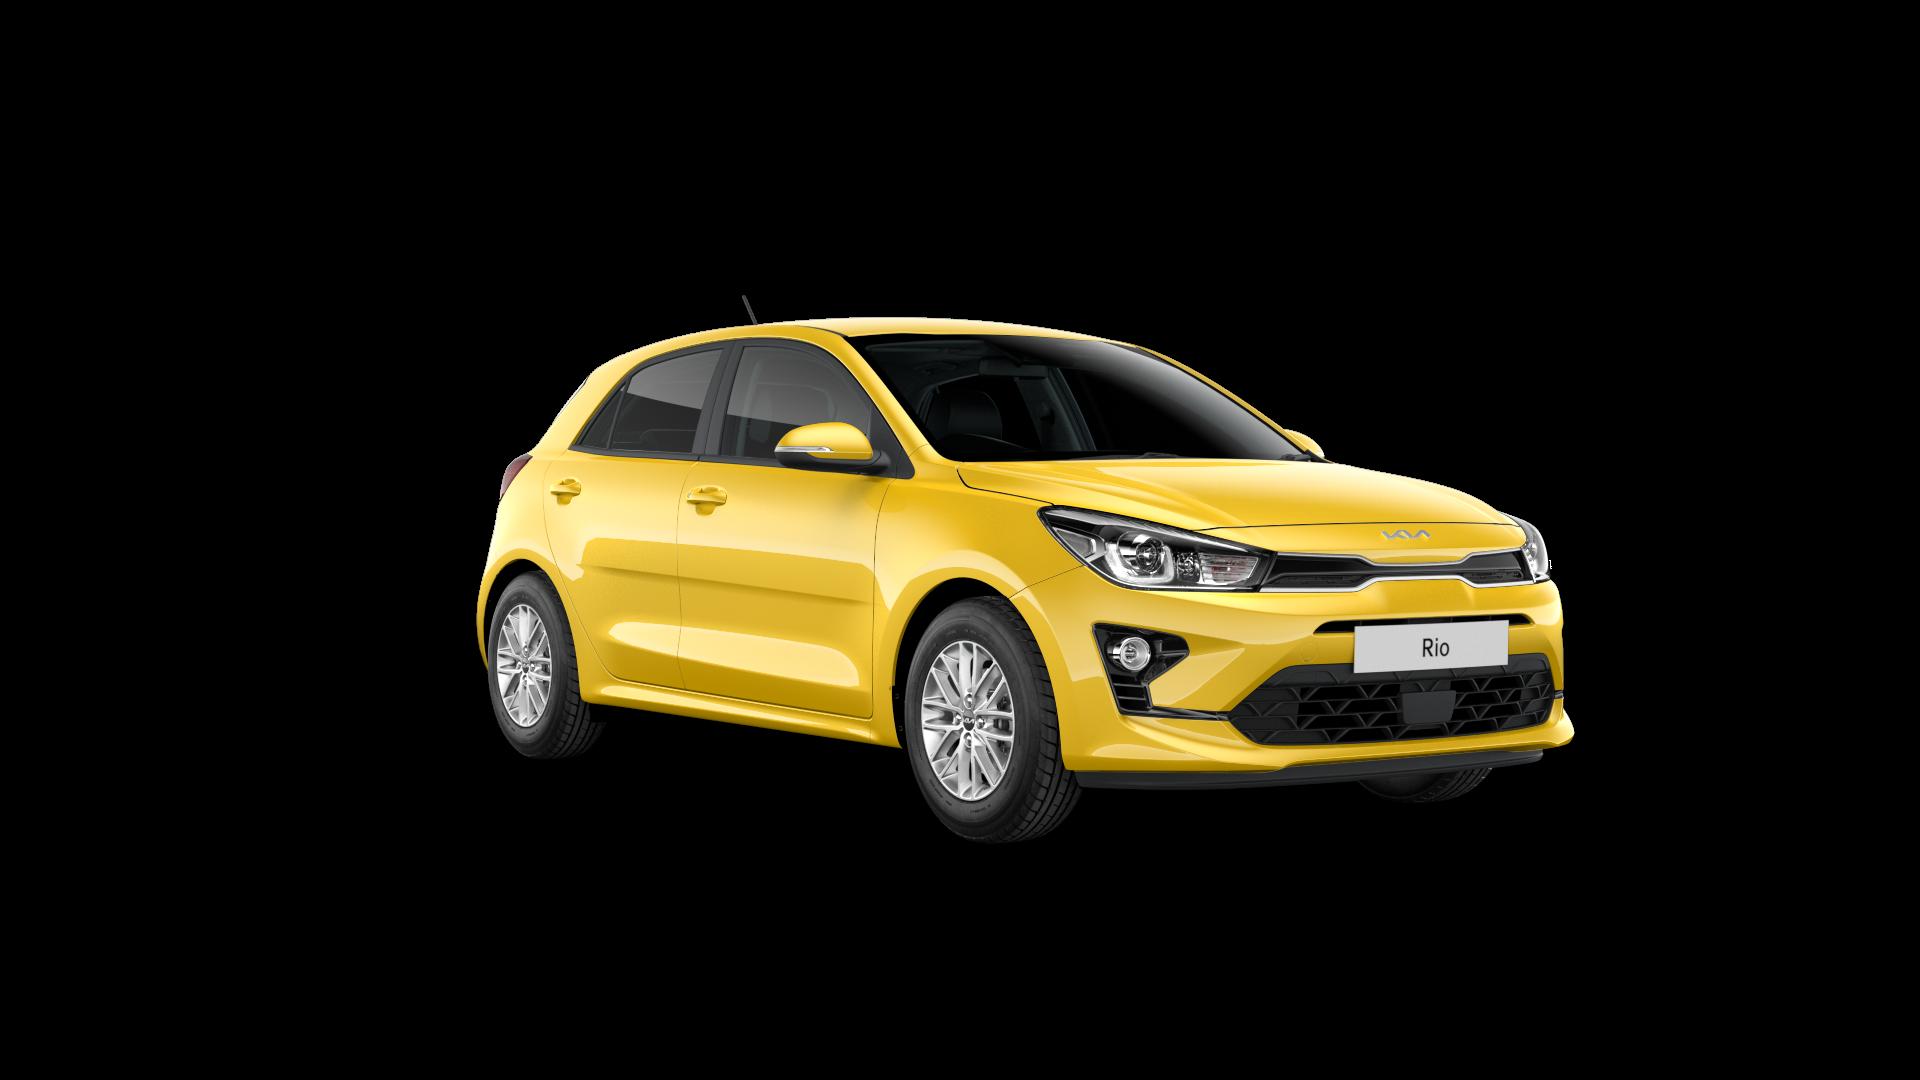 rio_2017 in zest-yellow